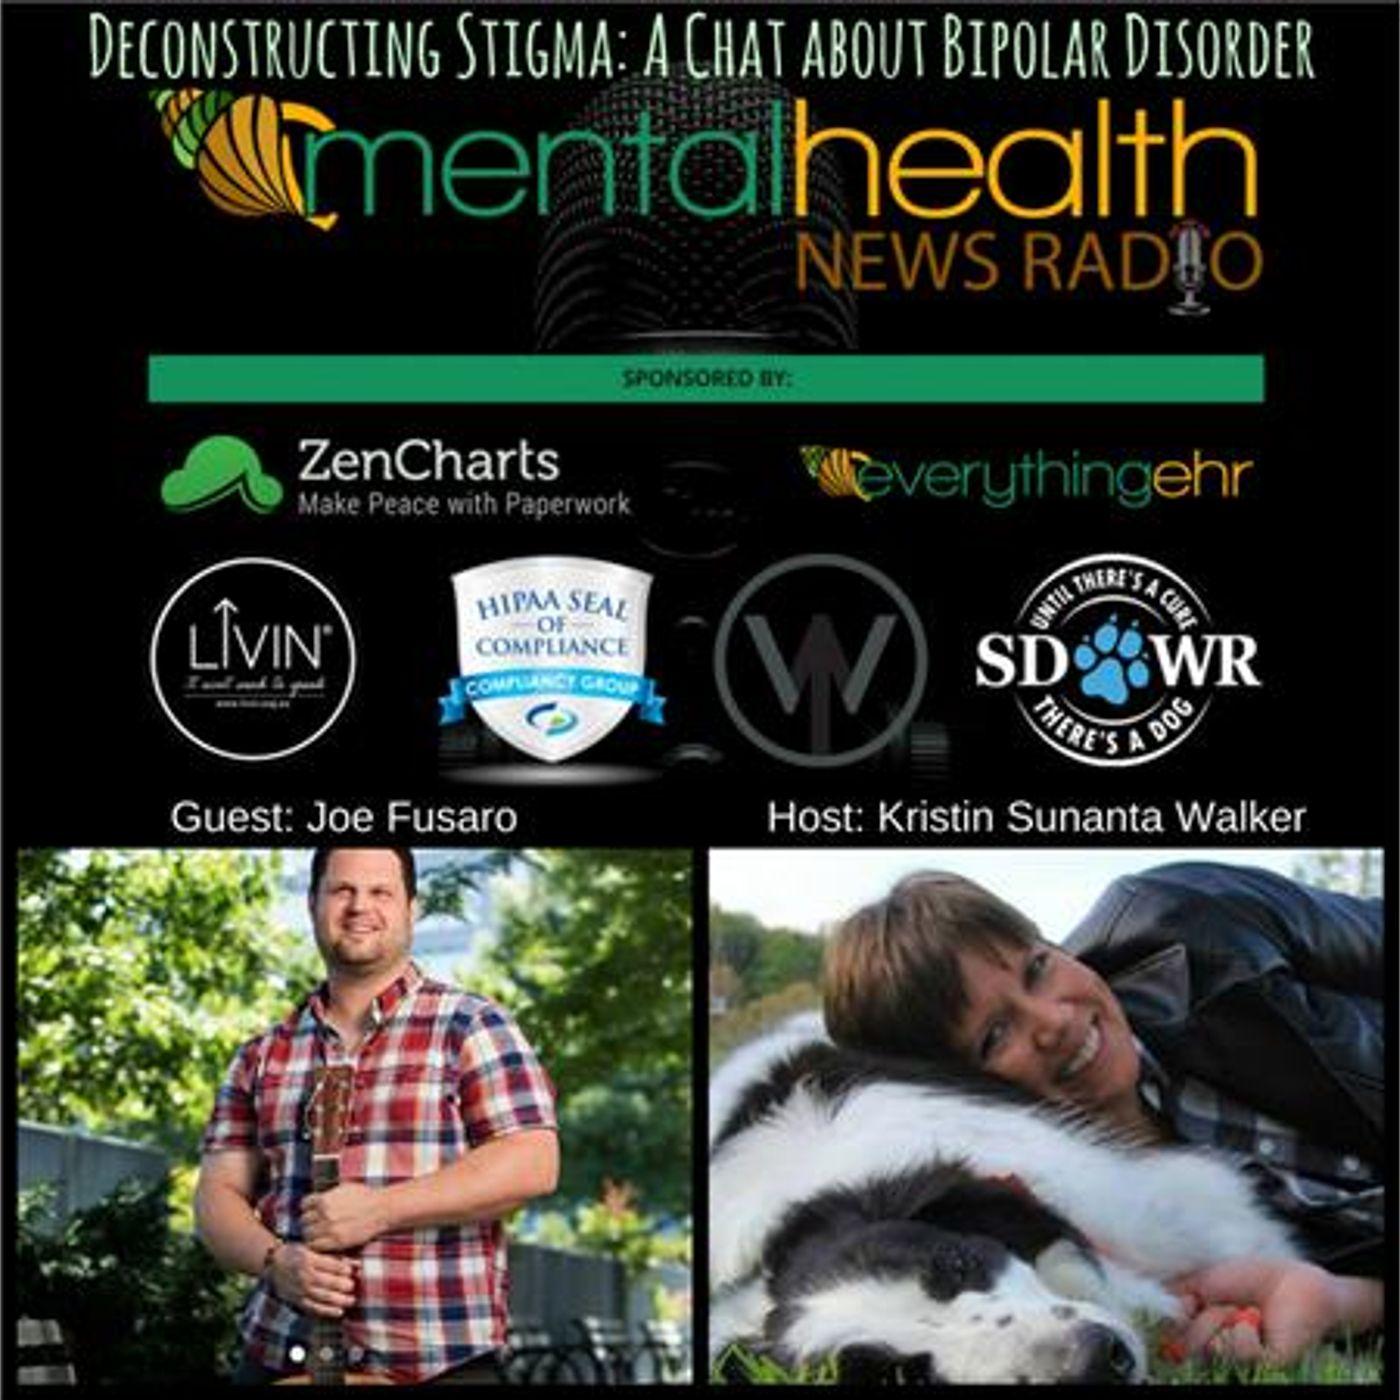 Mental Health News Radio - Deconstructing Stigma: A Chat About Bipolar Disorder with Joe Fusaro